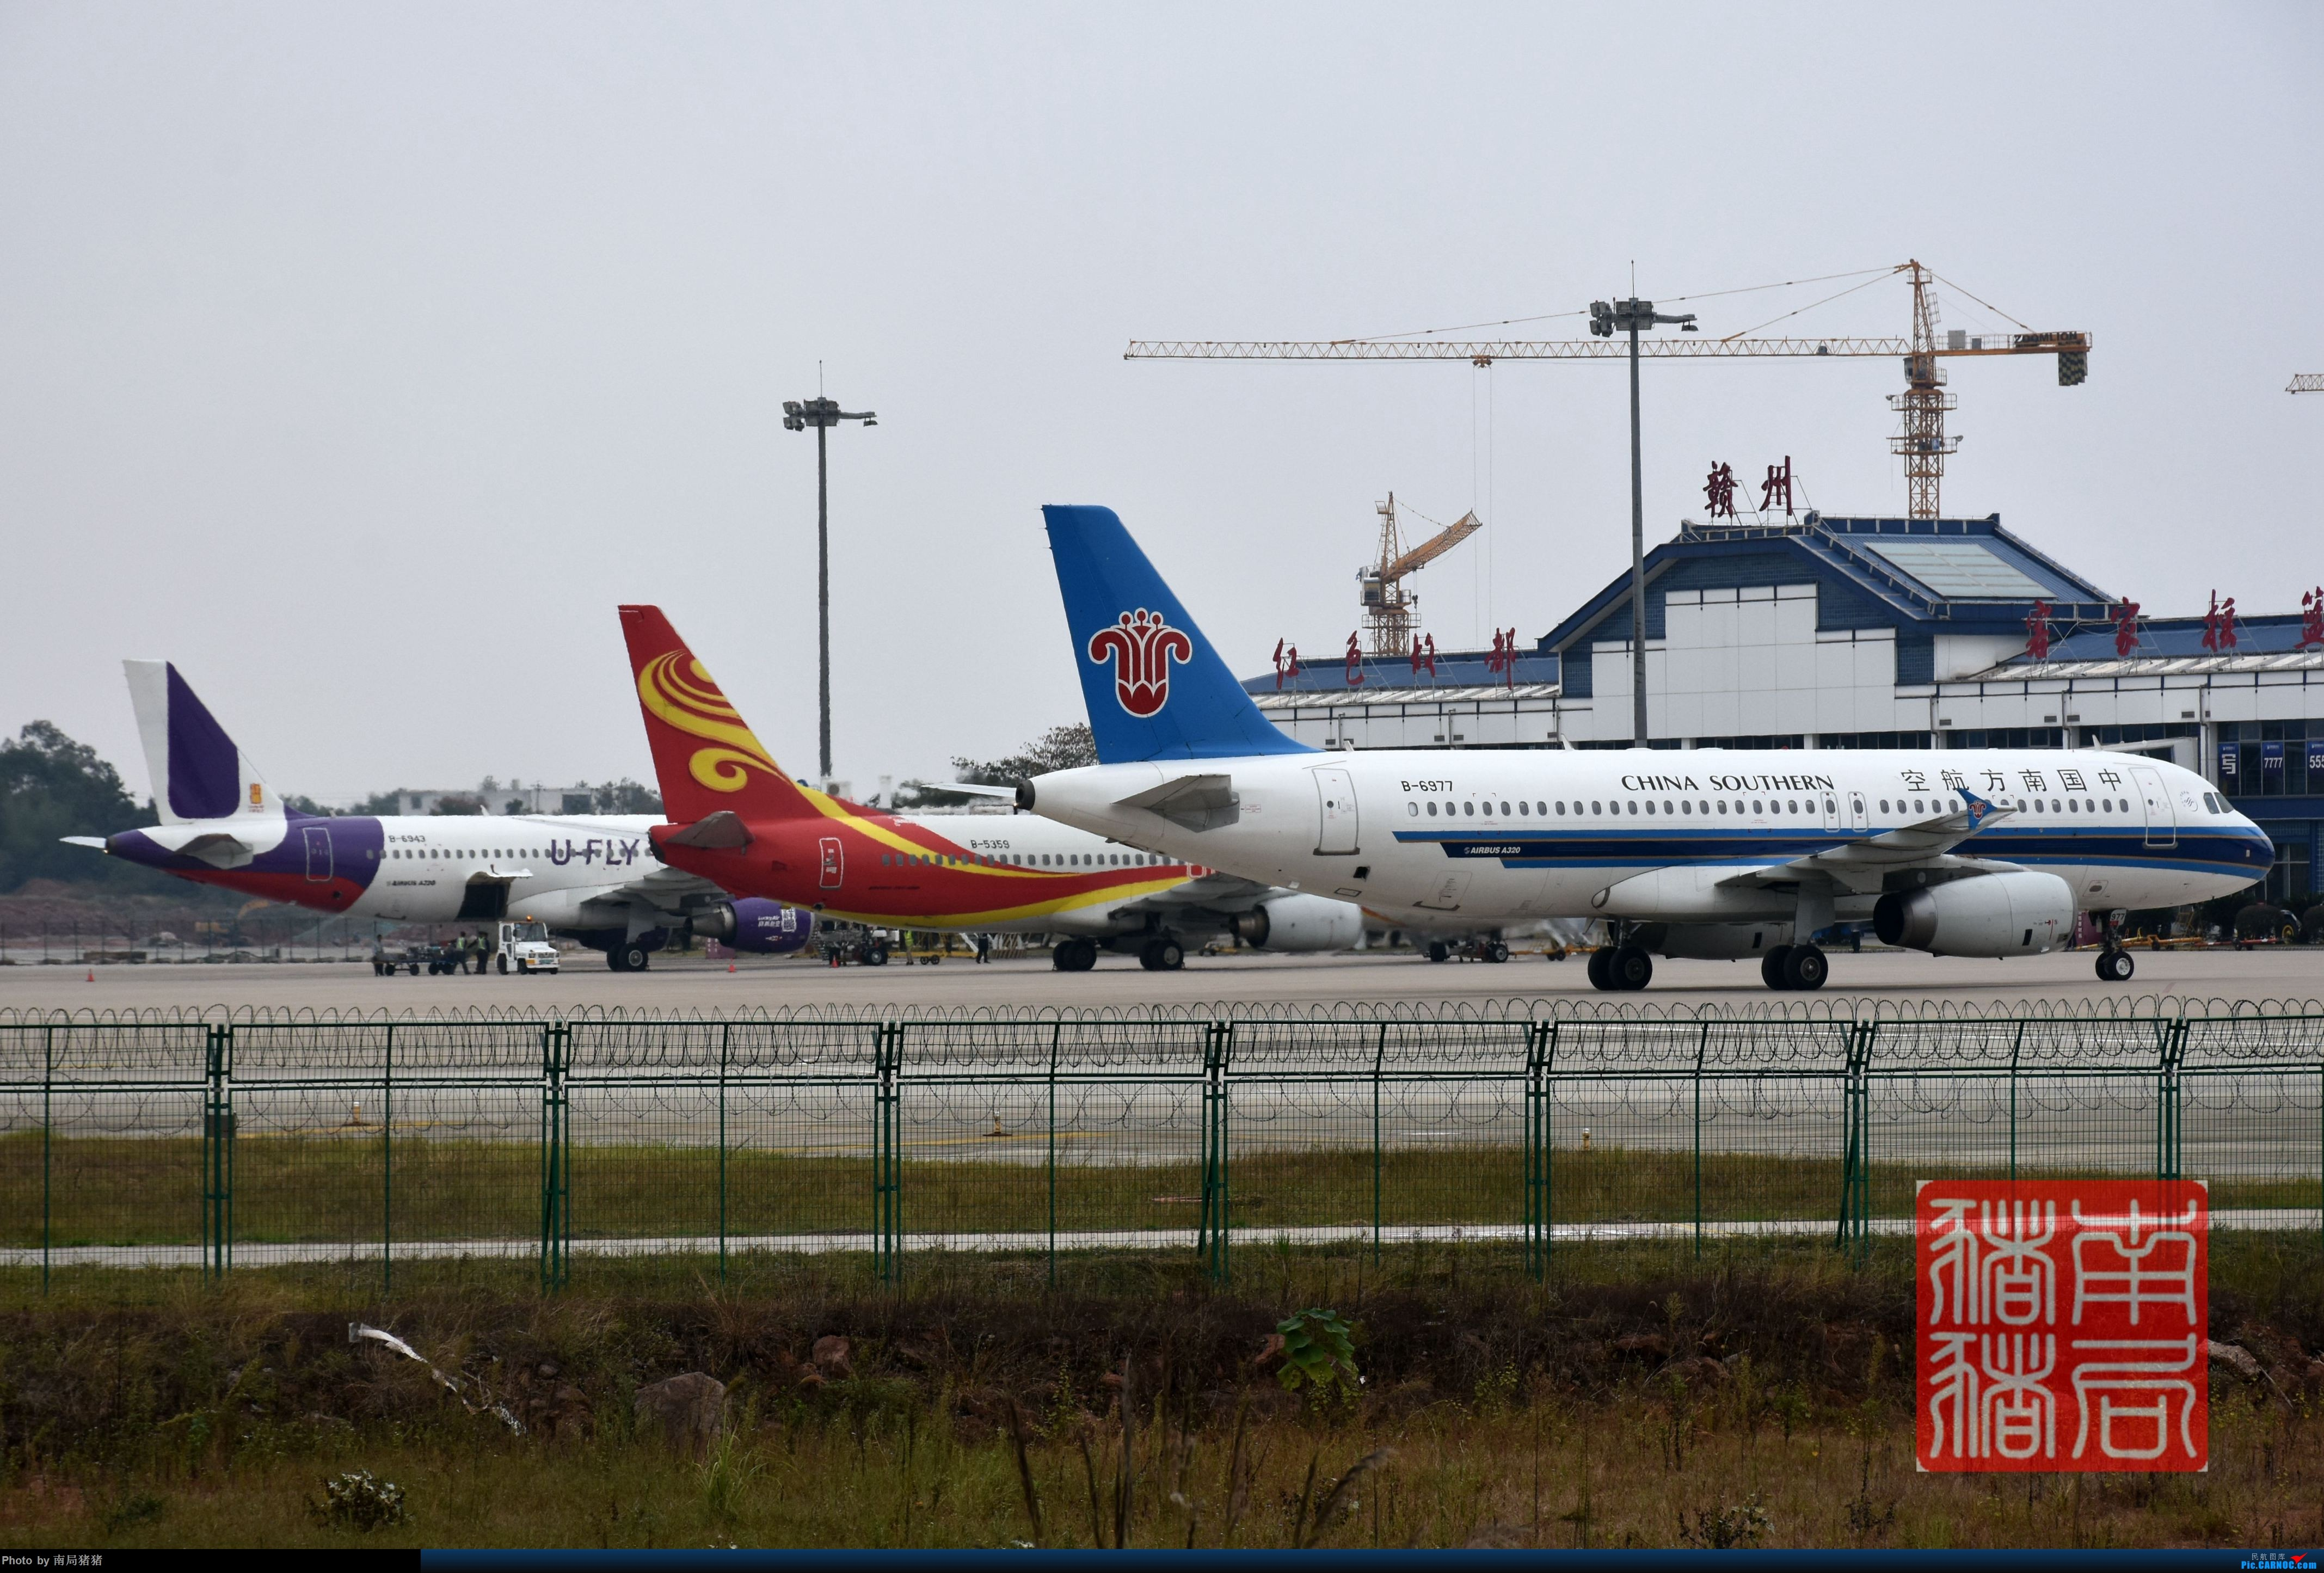 Re:[原创]赣州黄金机场,U fly 涂装320 AIRBUS A320-200 B-6977 中国赣州黄金机场